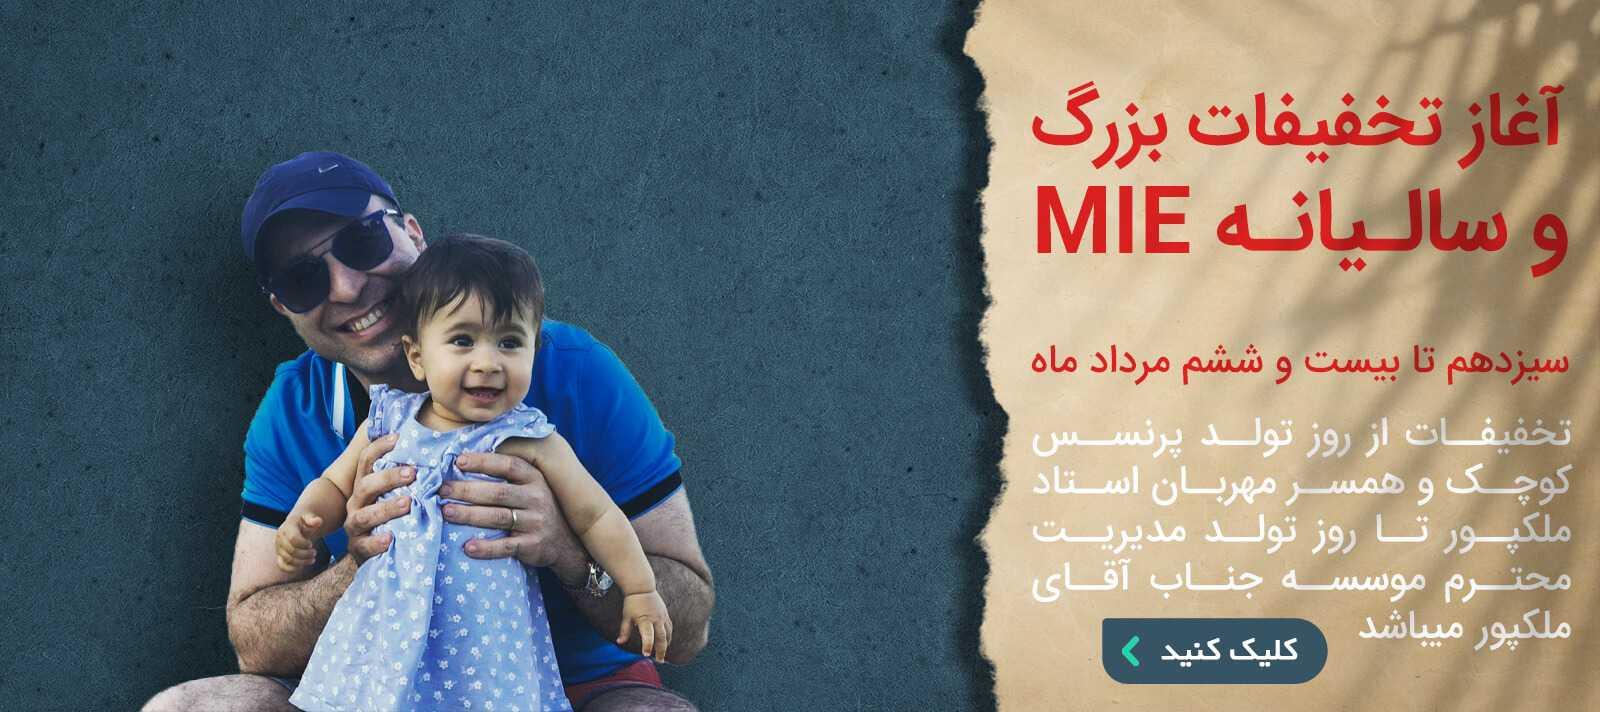 malekpourmie offer banner edited صفحه اصلی موسسه حقوقی ملکپور